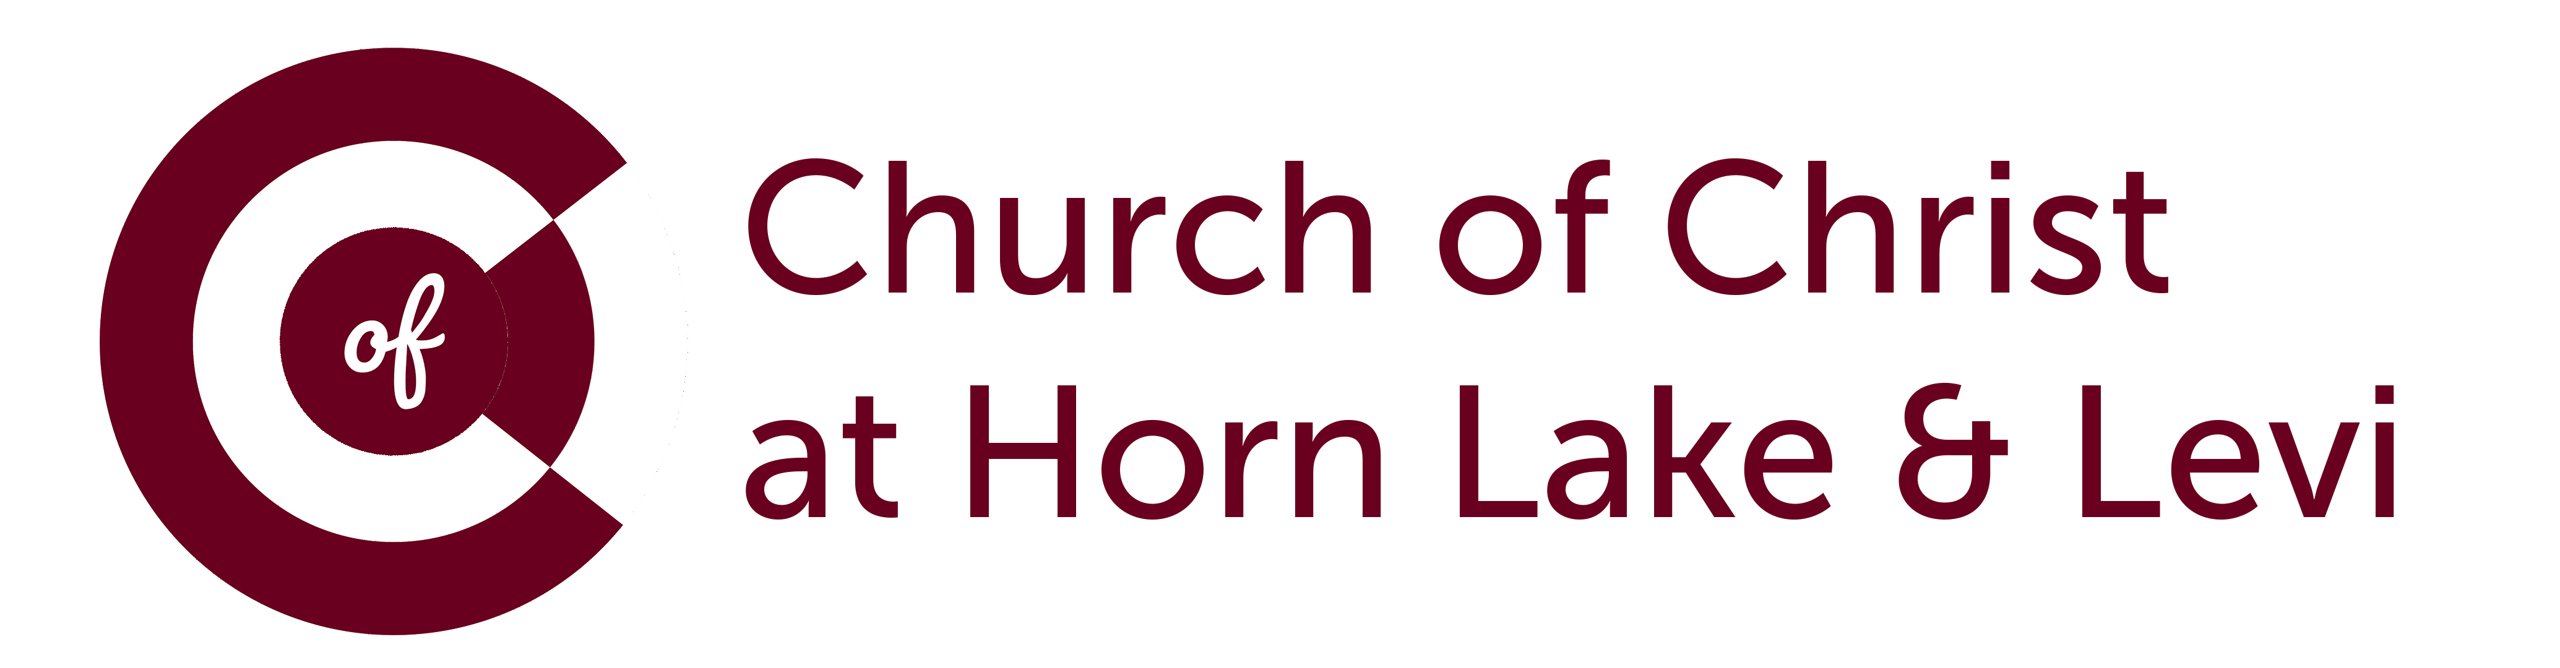 Church of Christ at Horn Lake & Levi